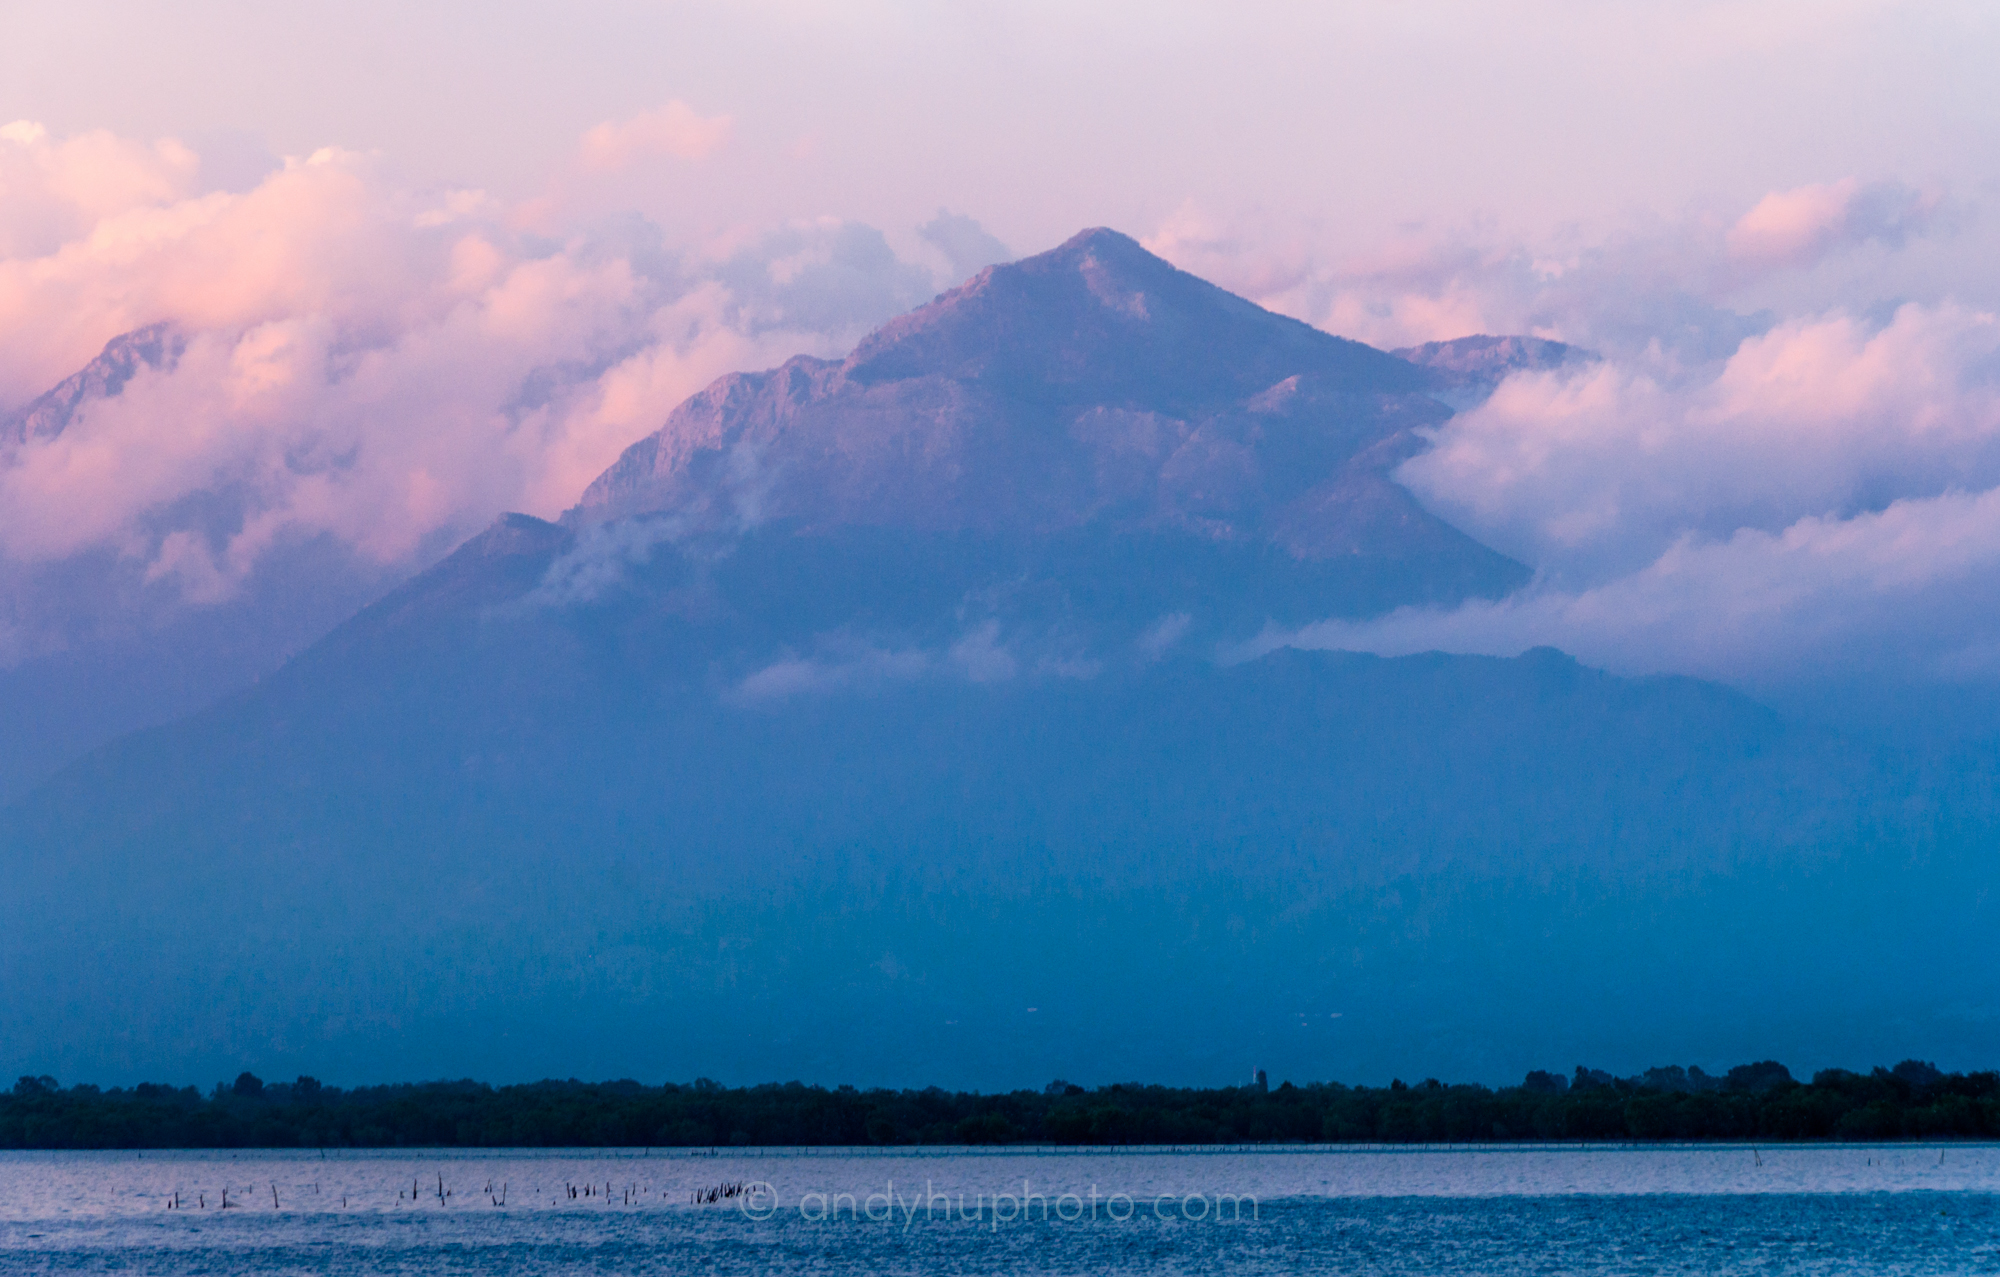 Skadarsko Jezero (Lake Skadar) and the Accursed Mountains